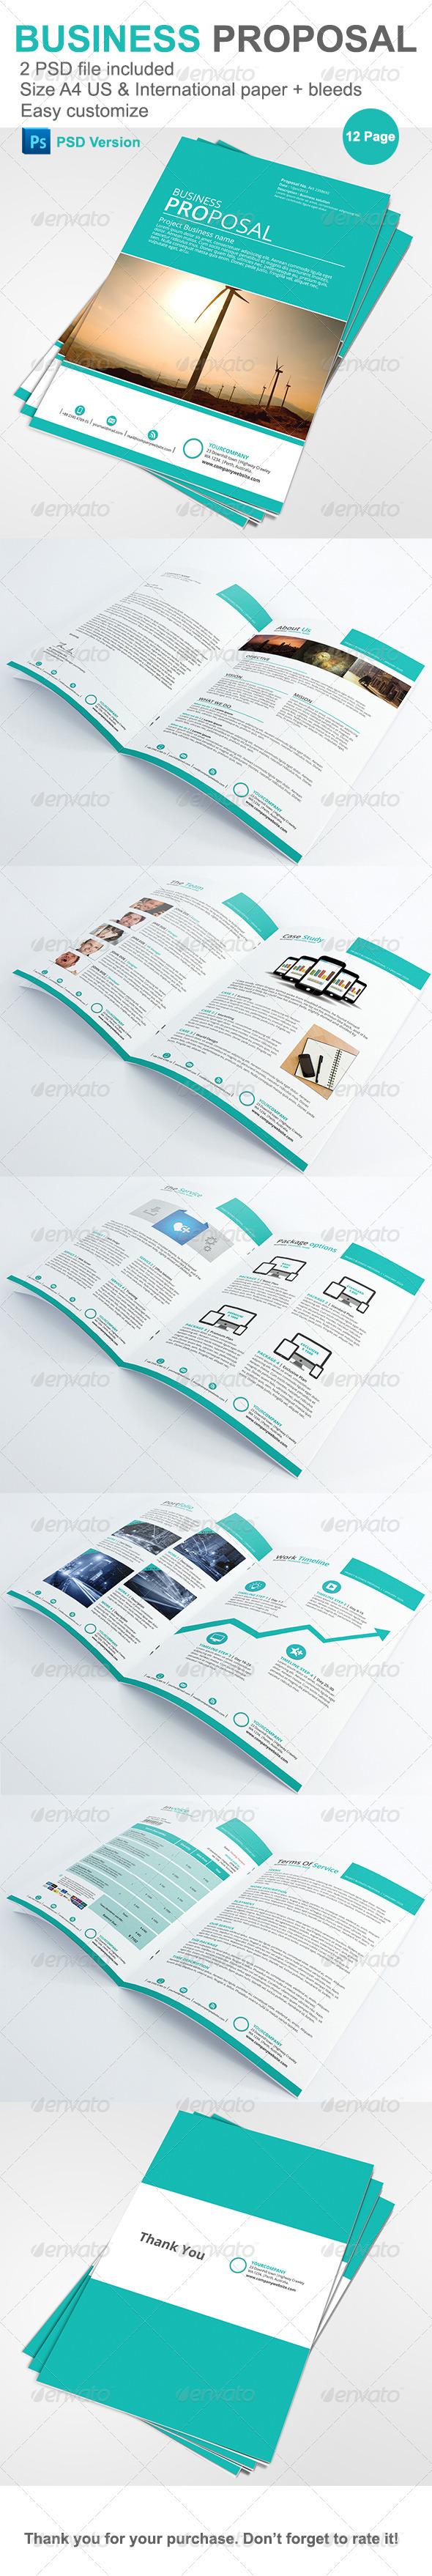 GraphicRiver Gstudio Business Proposal Template 4004682